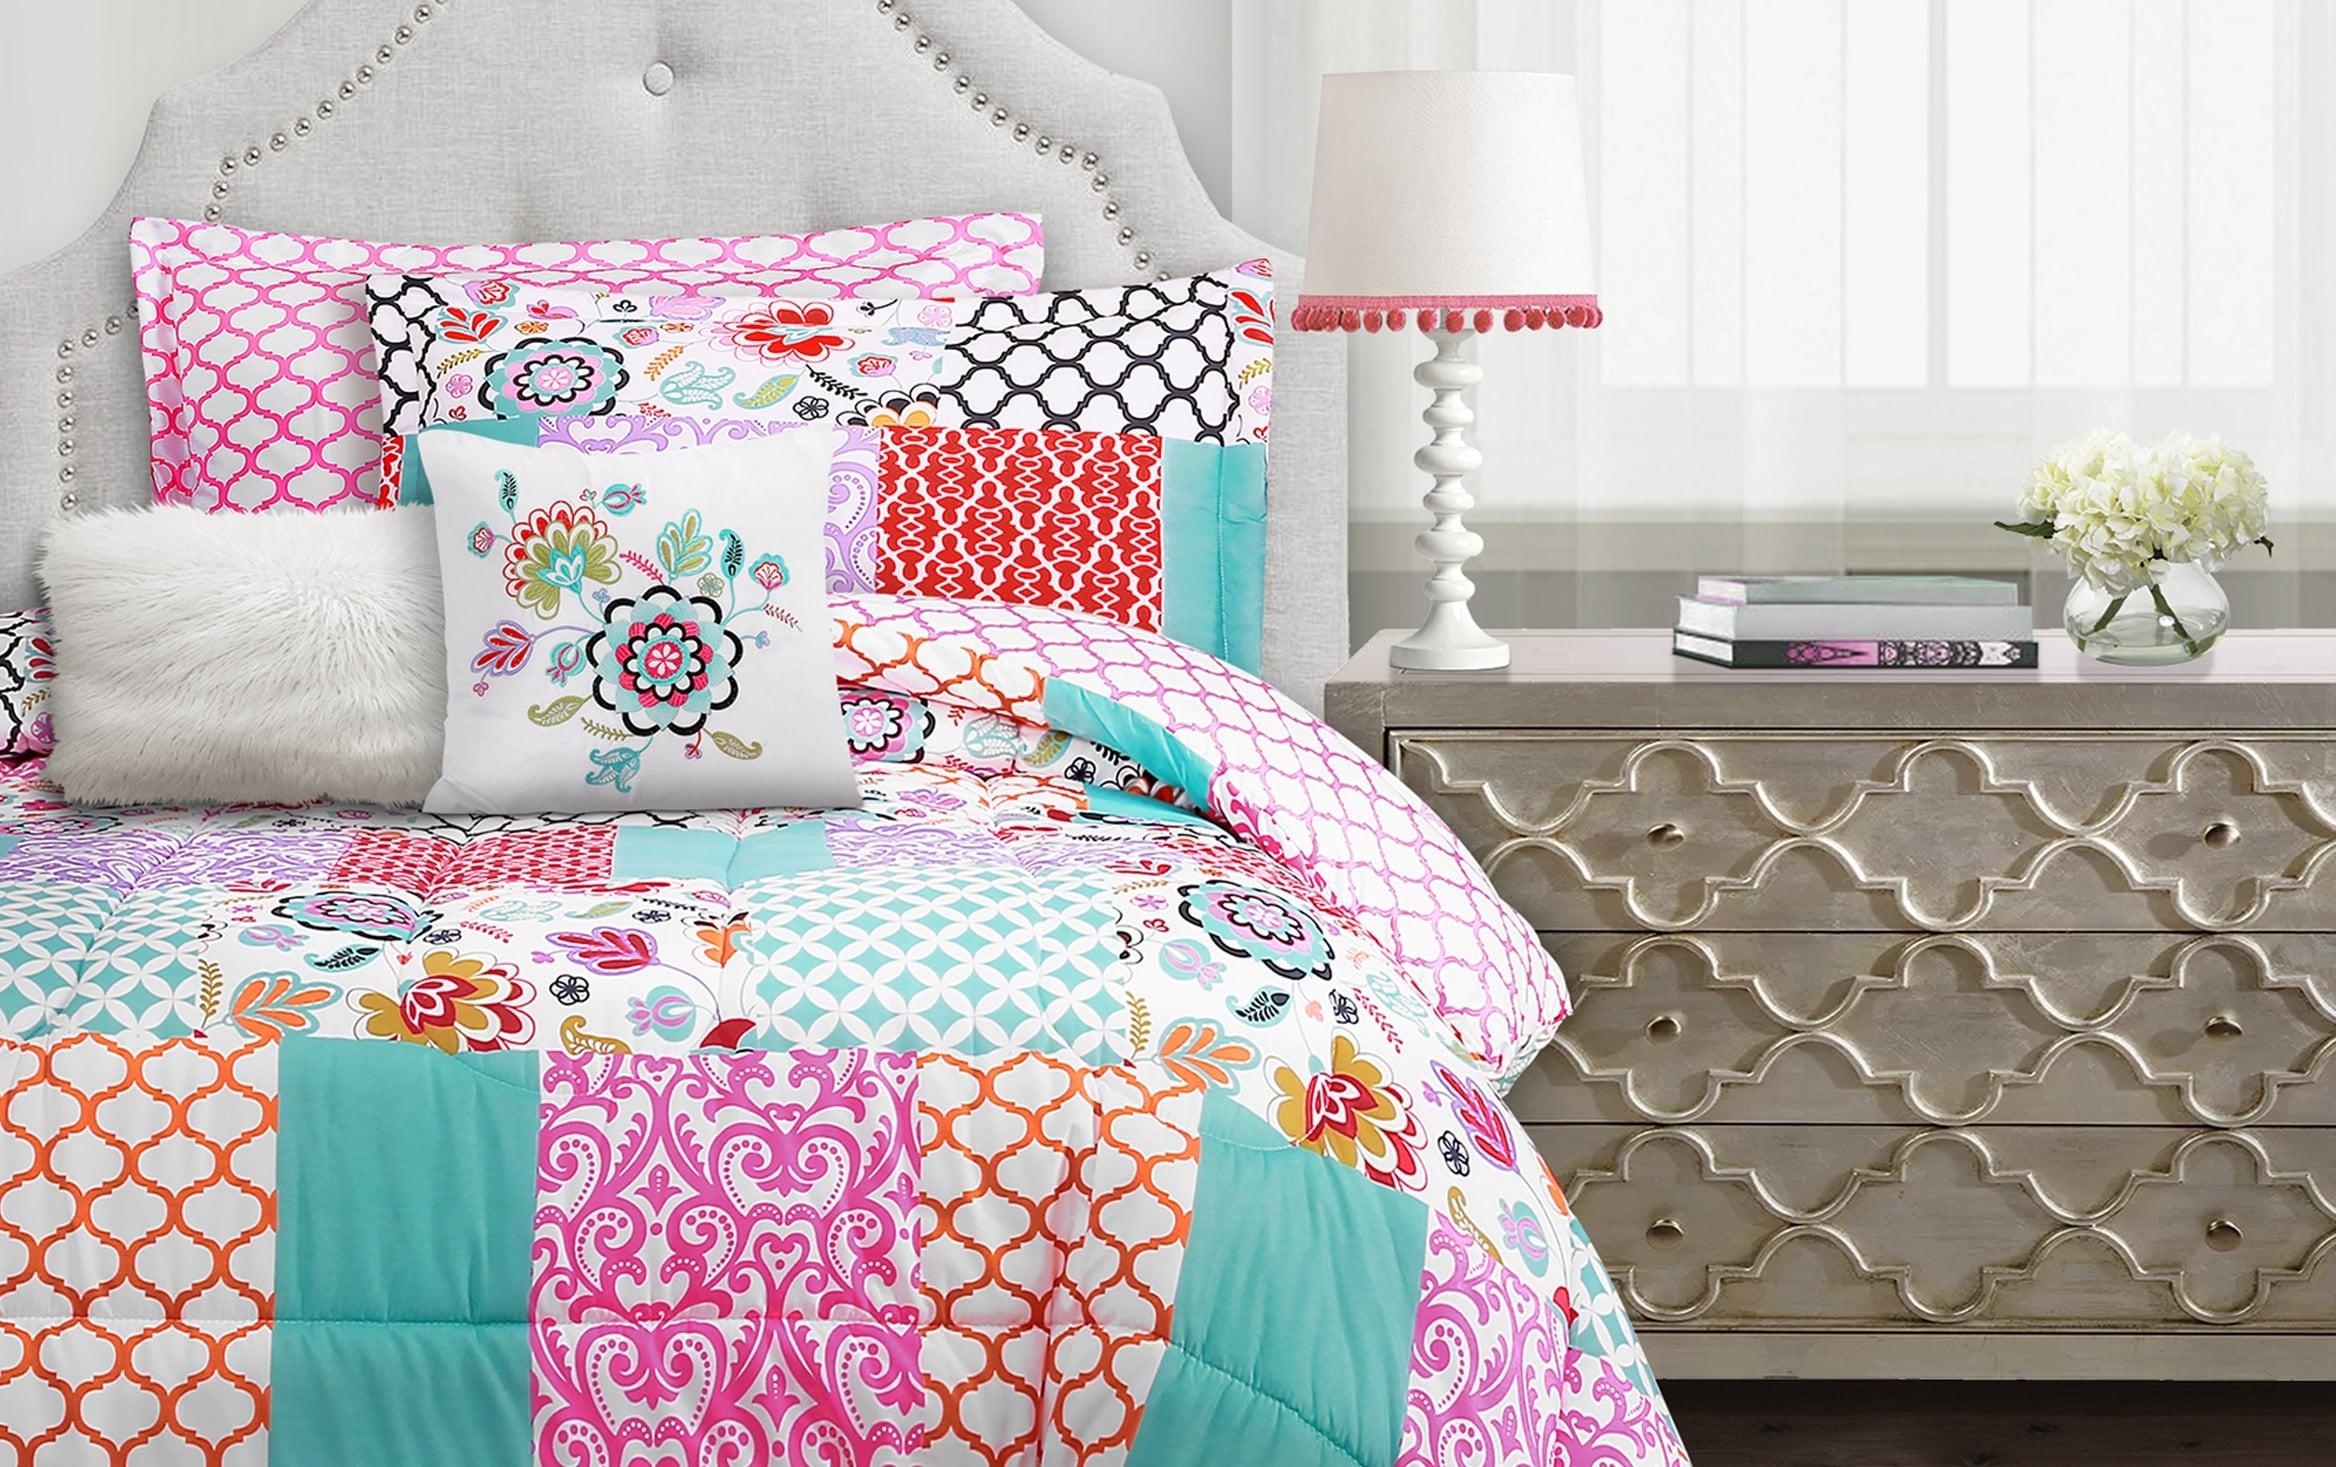 Bohemian Patchwork 5 Piece Twin Comforter Set Bobs Com